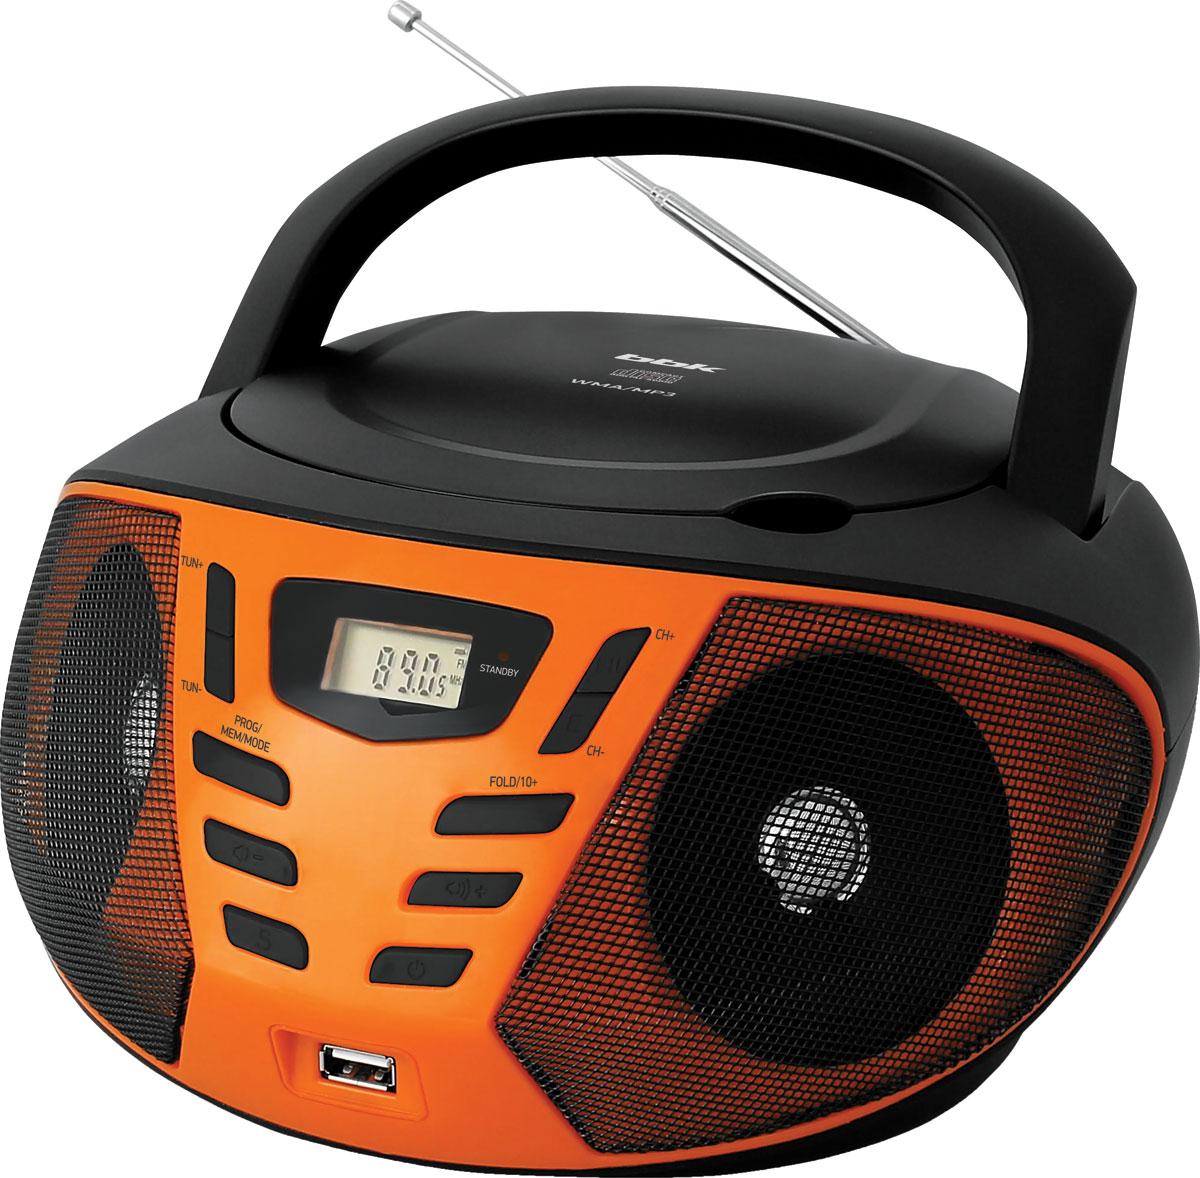 Магнитола BBK BX193U, Black Orange CD/MP3 BBK